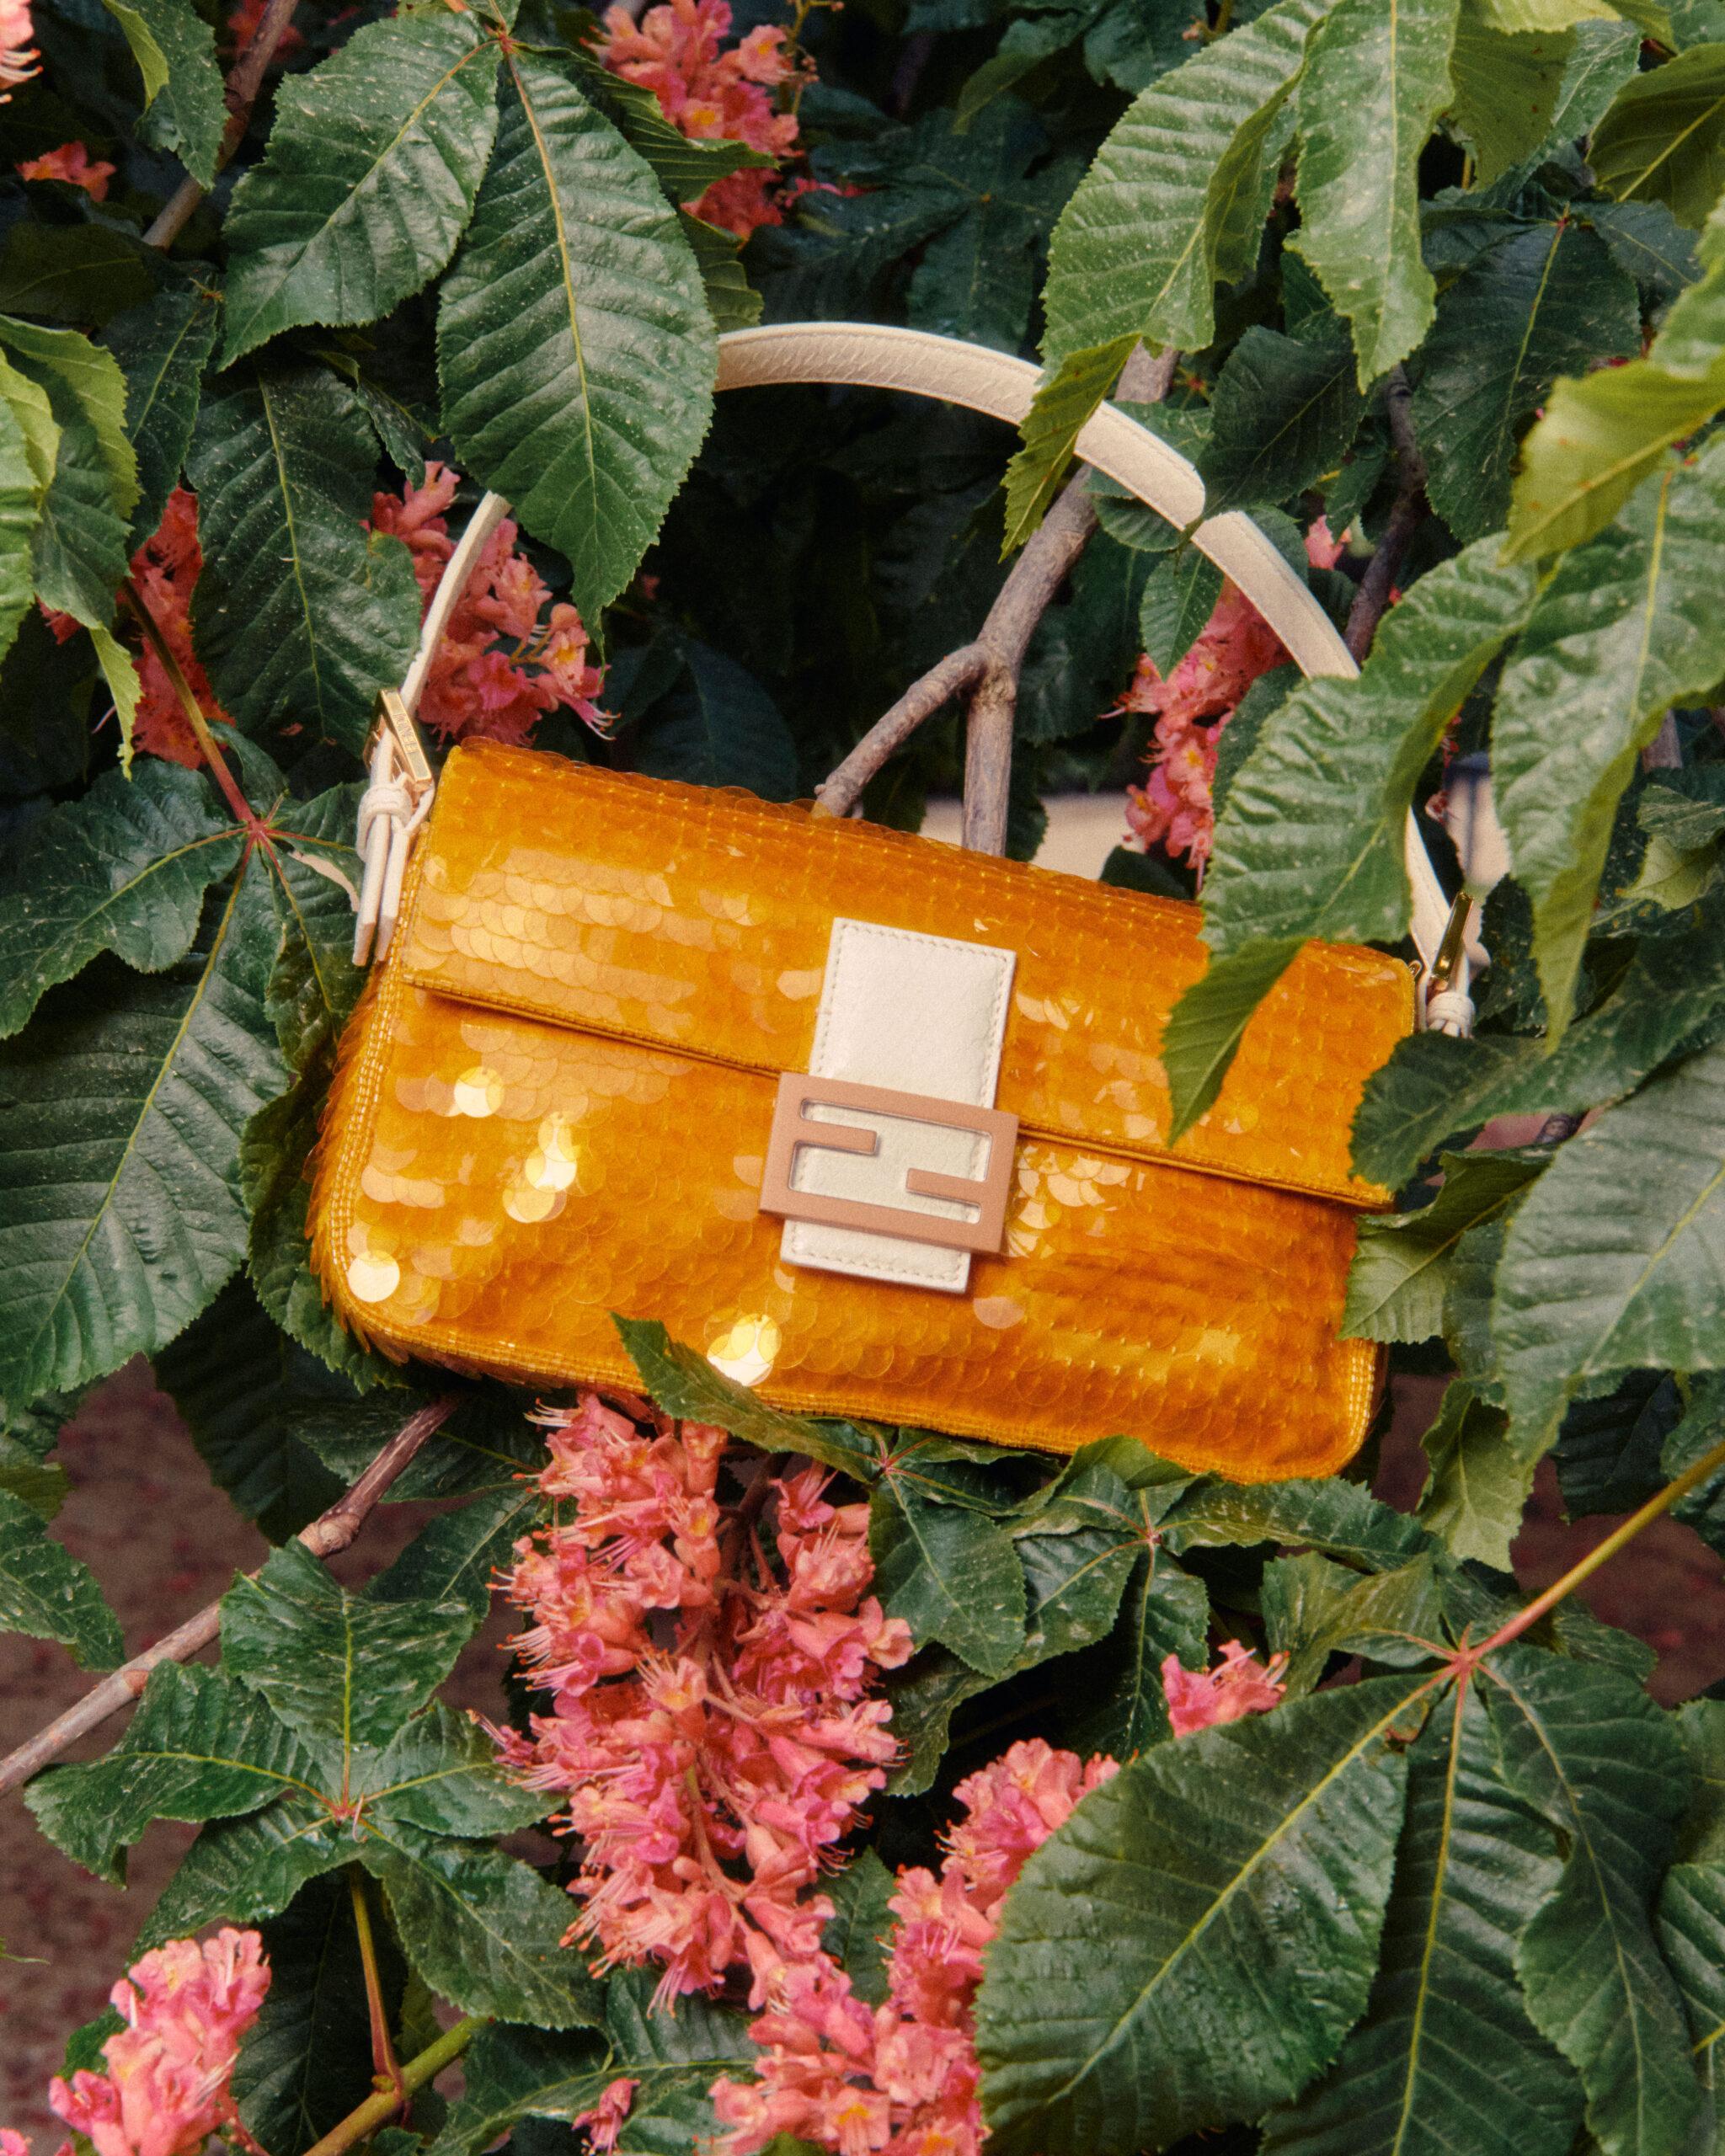 11 FENDI Baguette 1997 The Baguette Walk